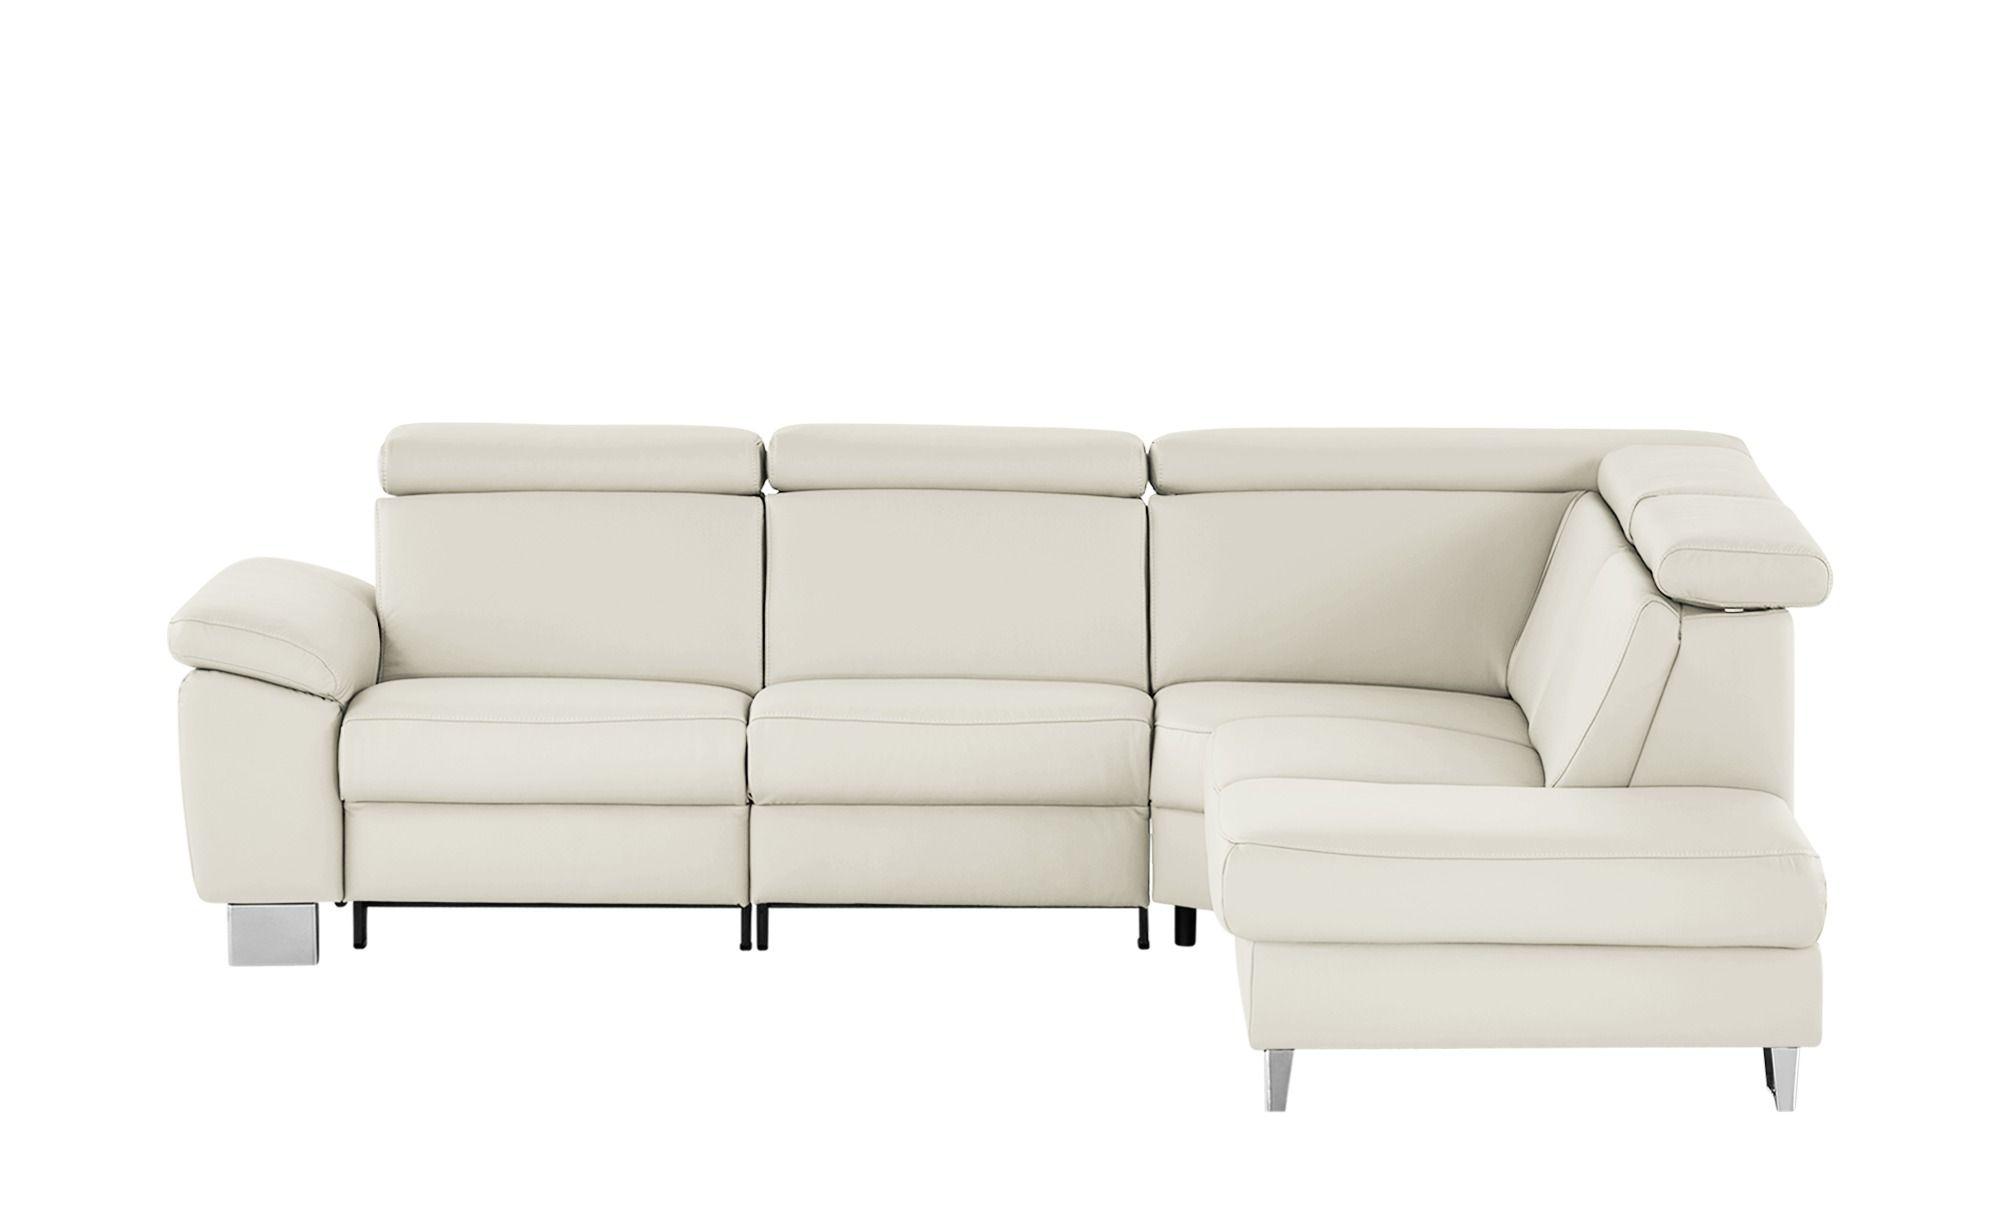 Meinsofa Ecksofa Beata Weiss Polstermobel Sofas Ecksofas Hoffner Kunstleder Couch Couch Gunstig Sofa Design